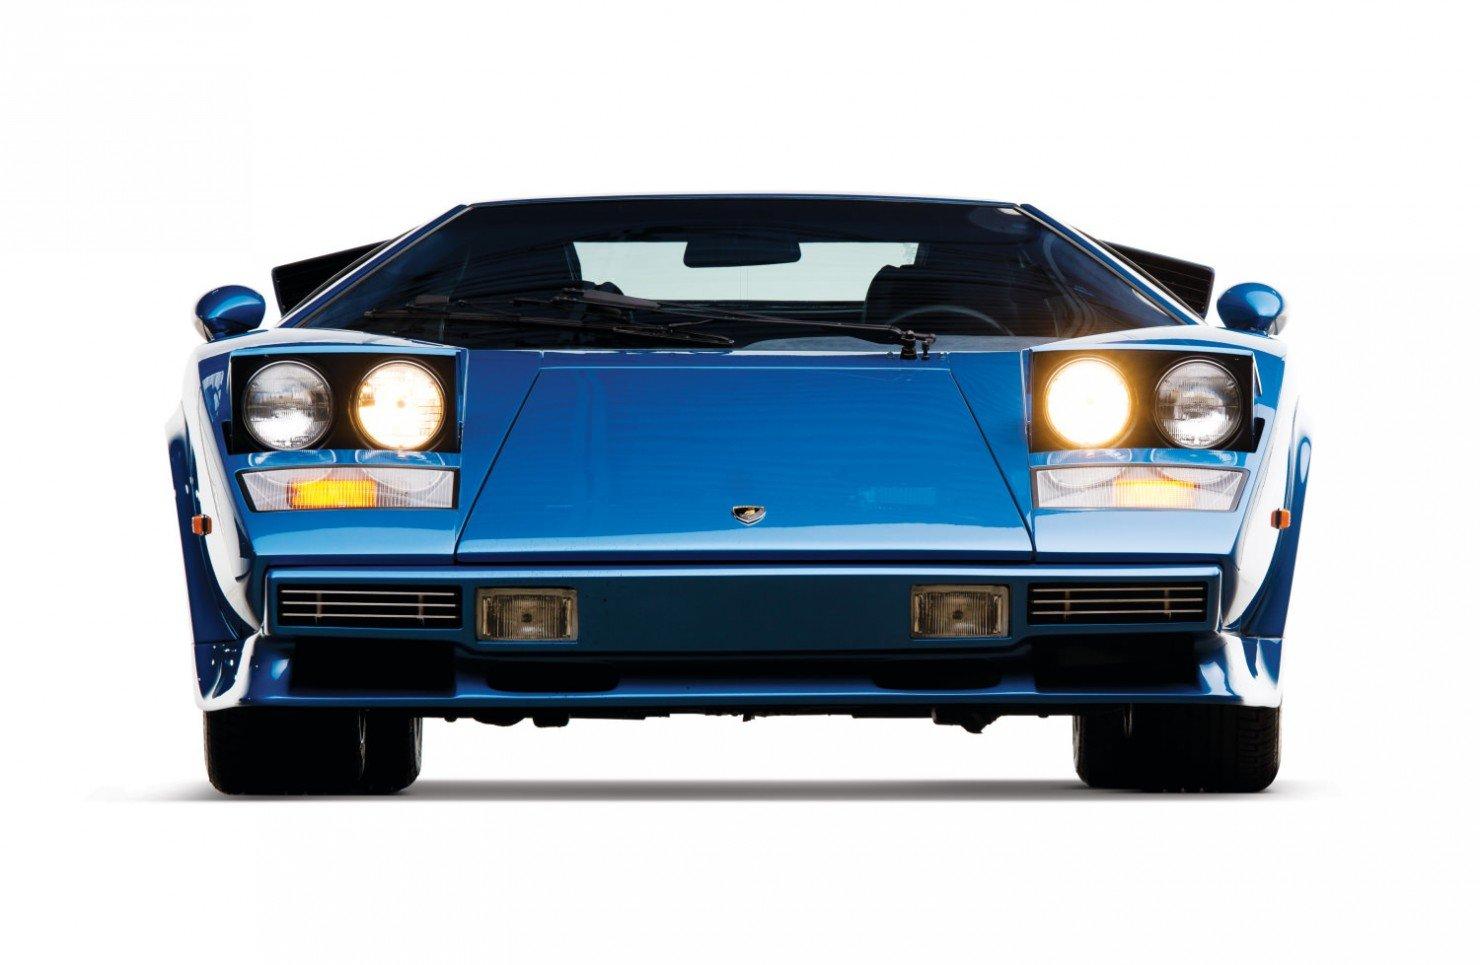 Lamborghini-Countach-LP400S-14